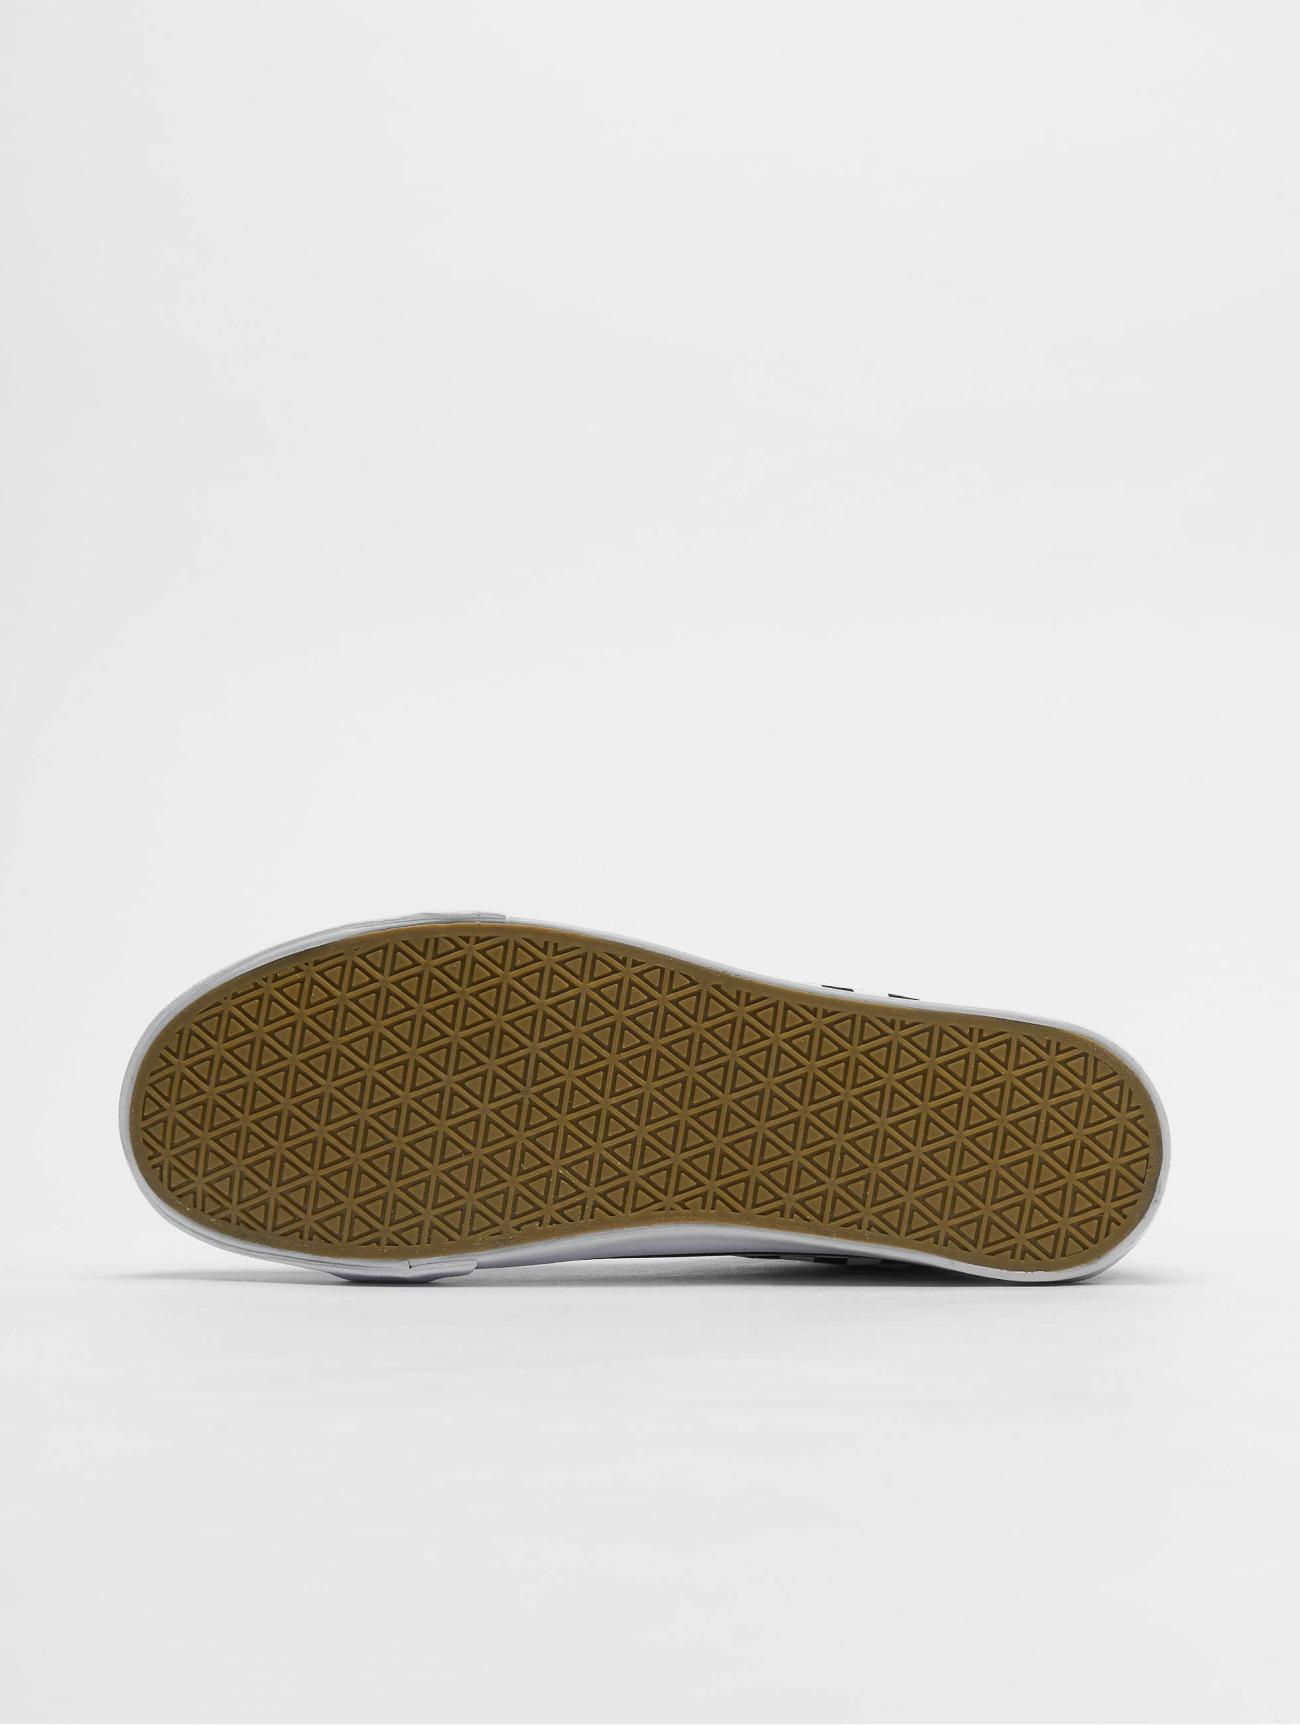 Urban Classics Printed High Canvas noir Baskets 635480 Homme Chaussures